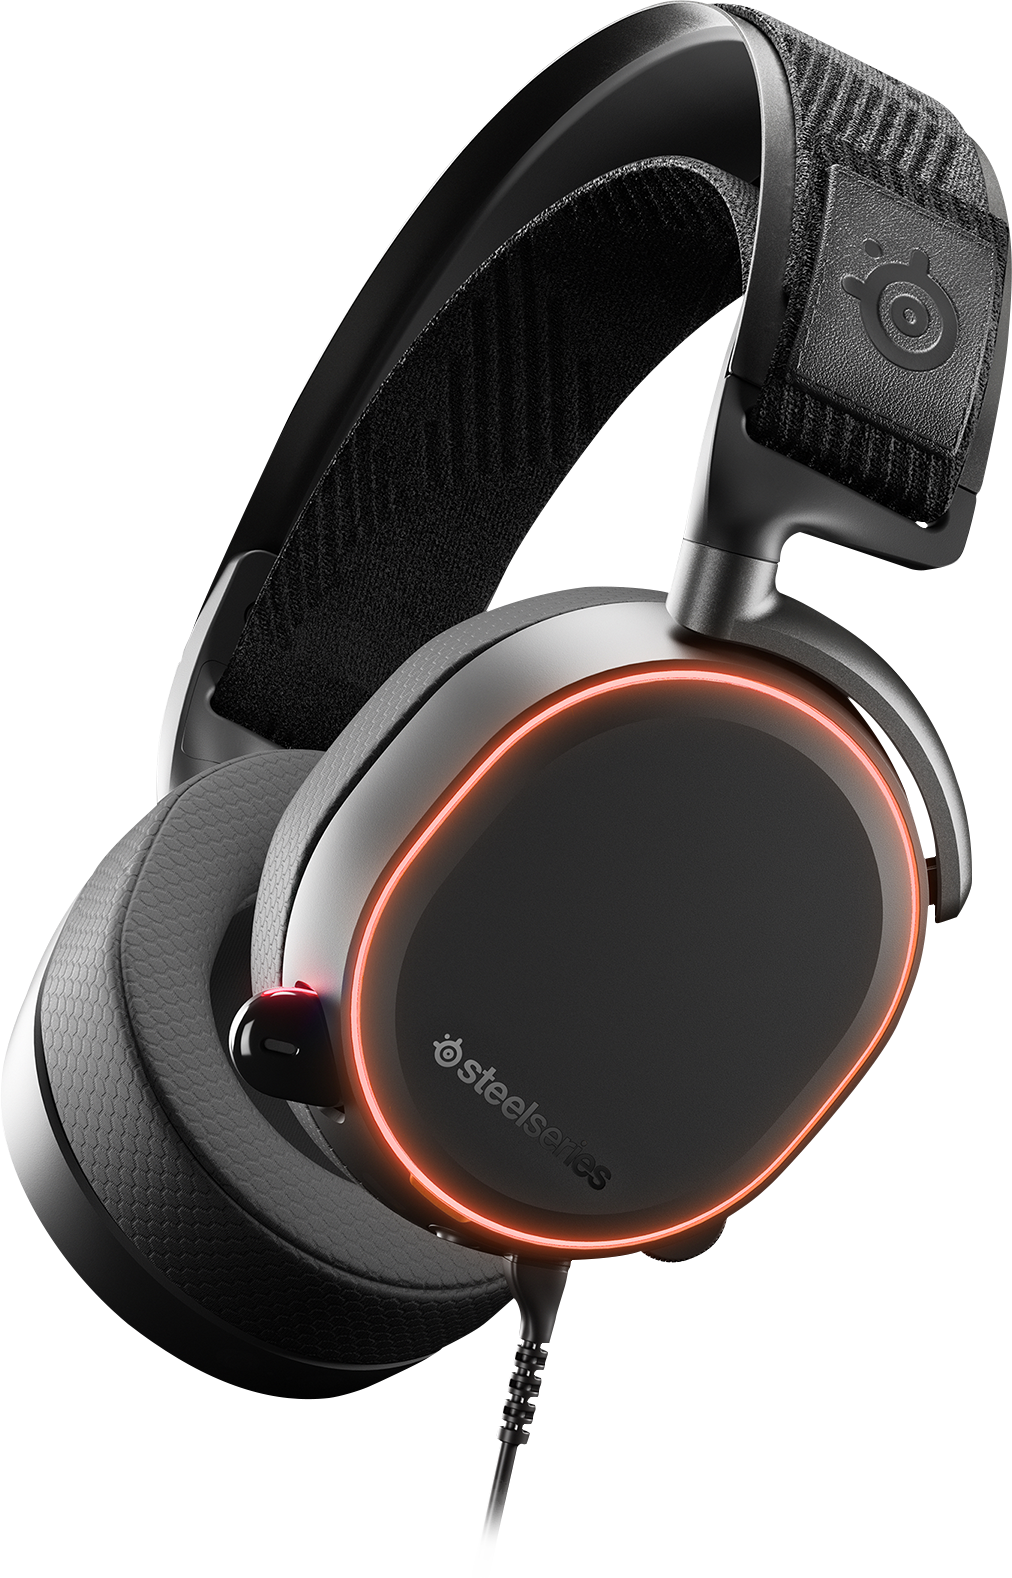 RE2OGXn?ver=7266 - SteelSeries Arctis Pro PC Gaming Headset